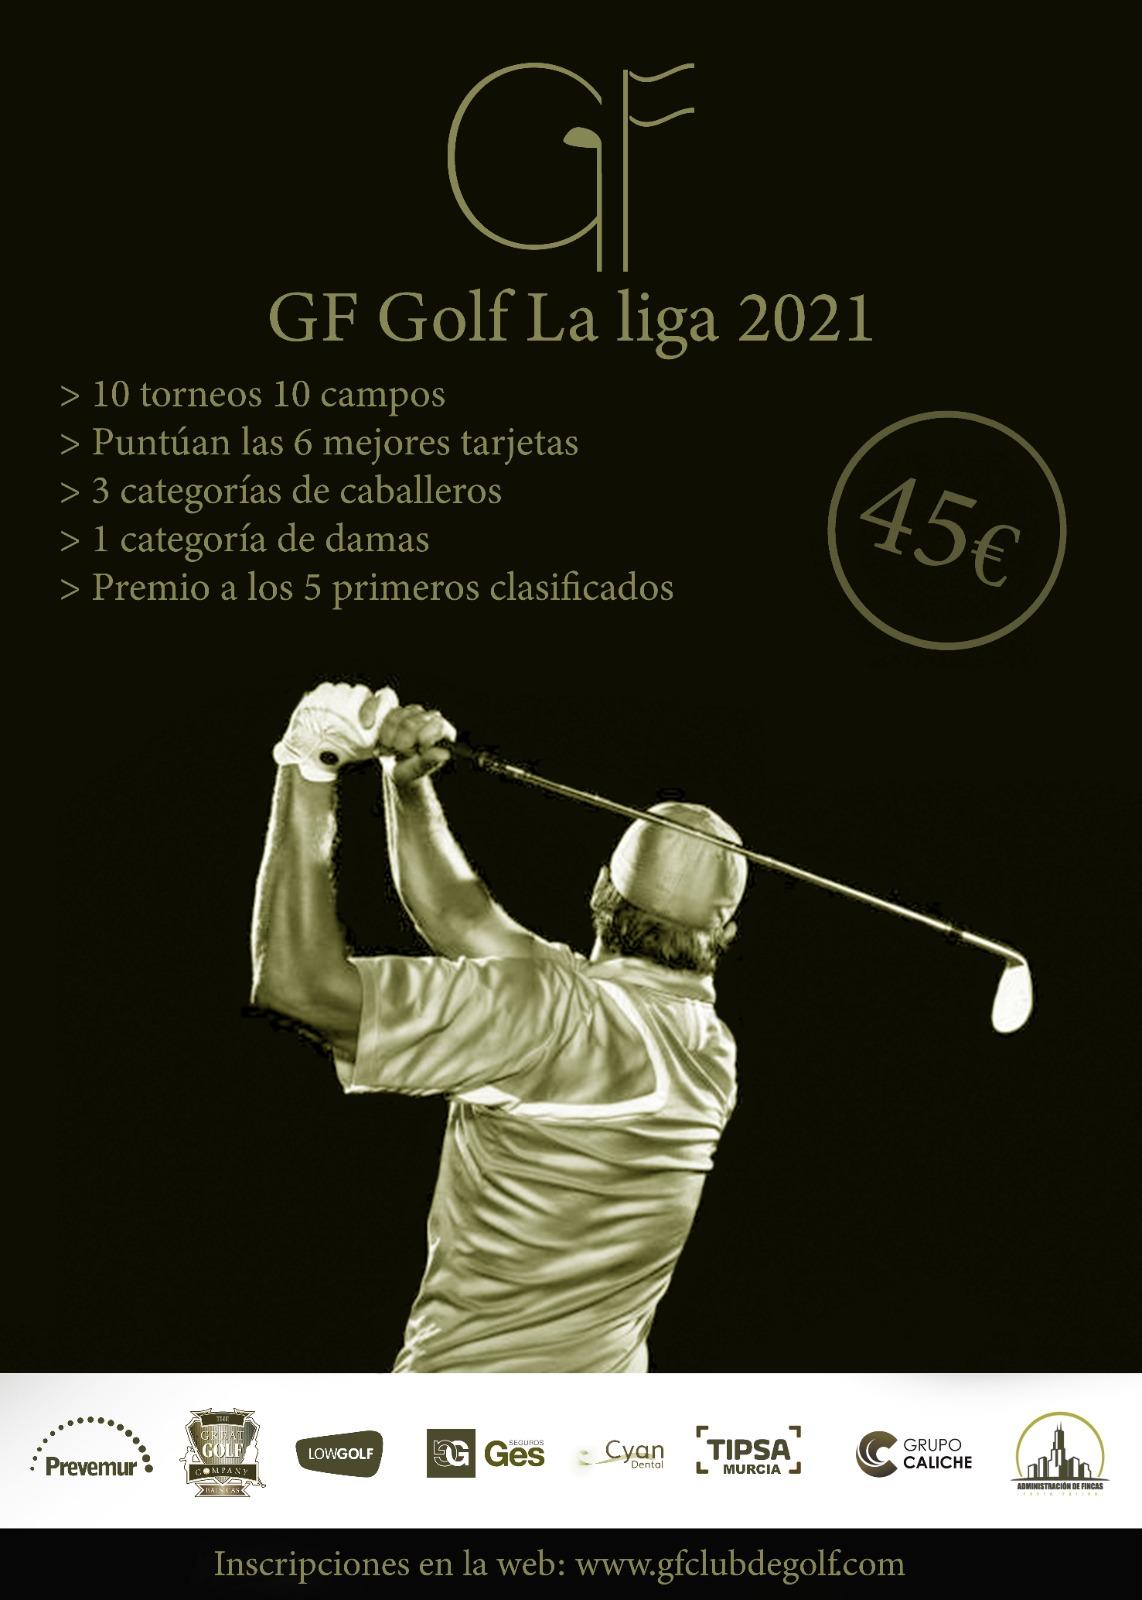 210326 GF, Cartel de La Liga 2021